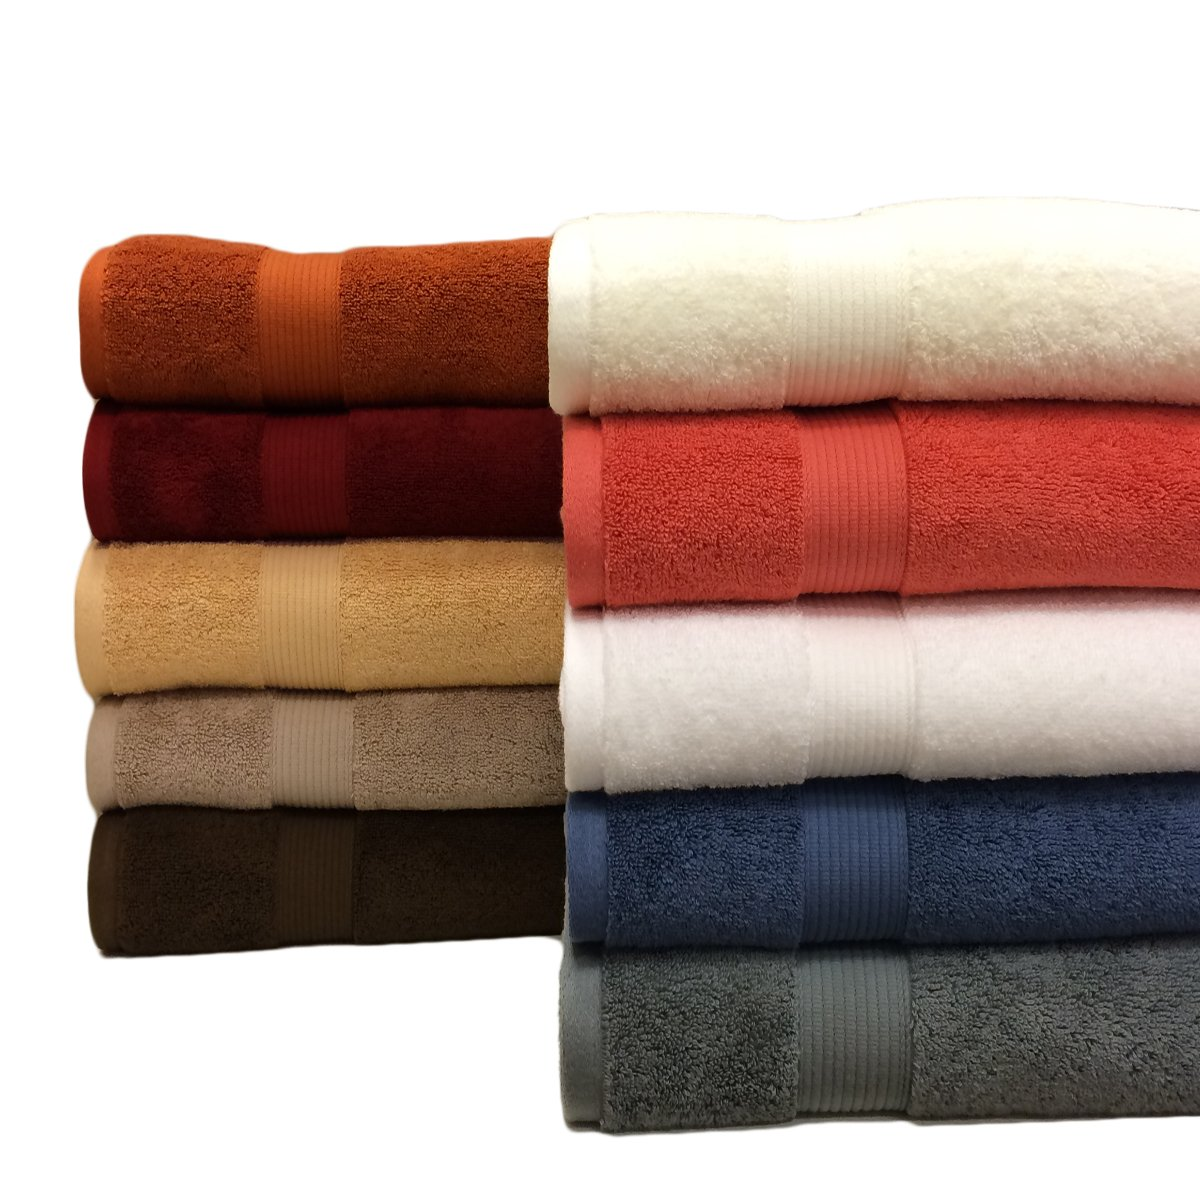 2 Cotton Plush Bath Sheets, Chocolate, Over 1.8lbs. Each